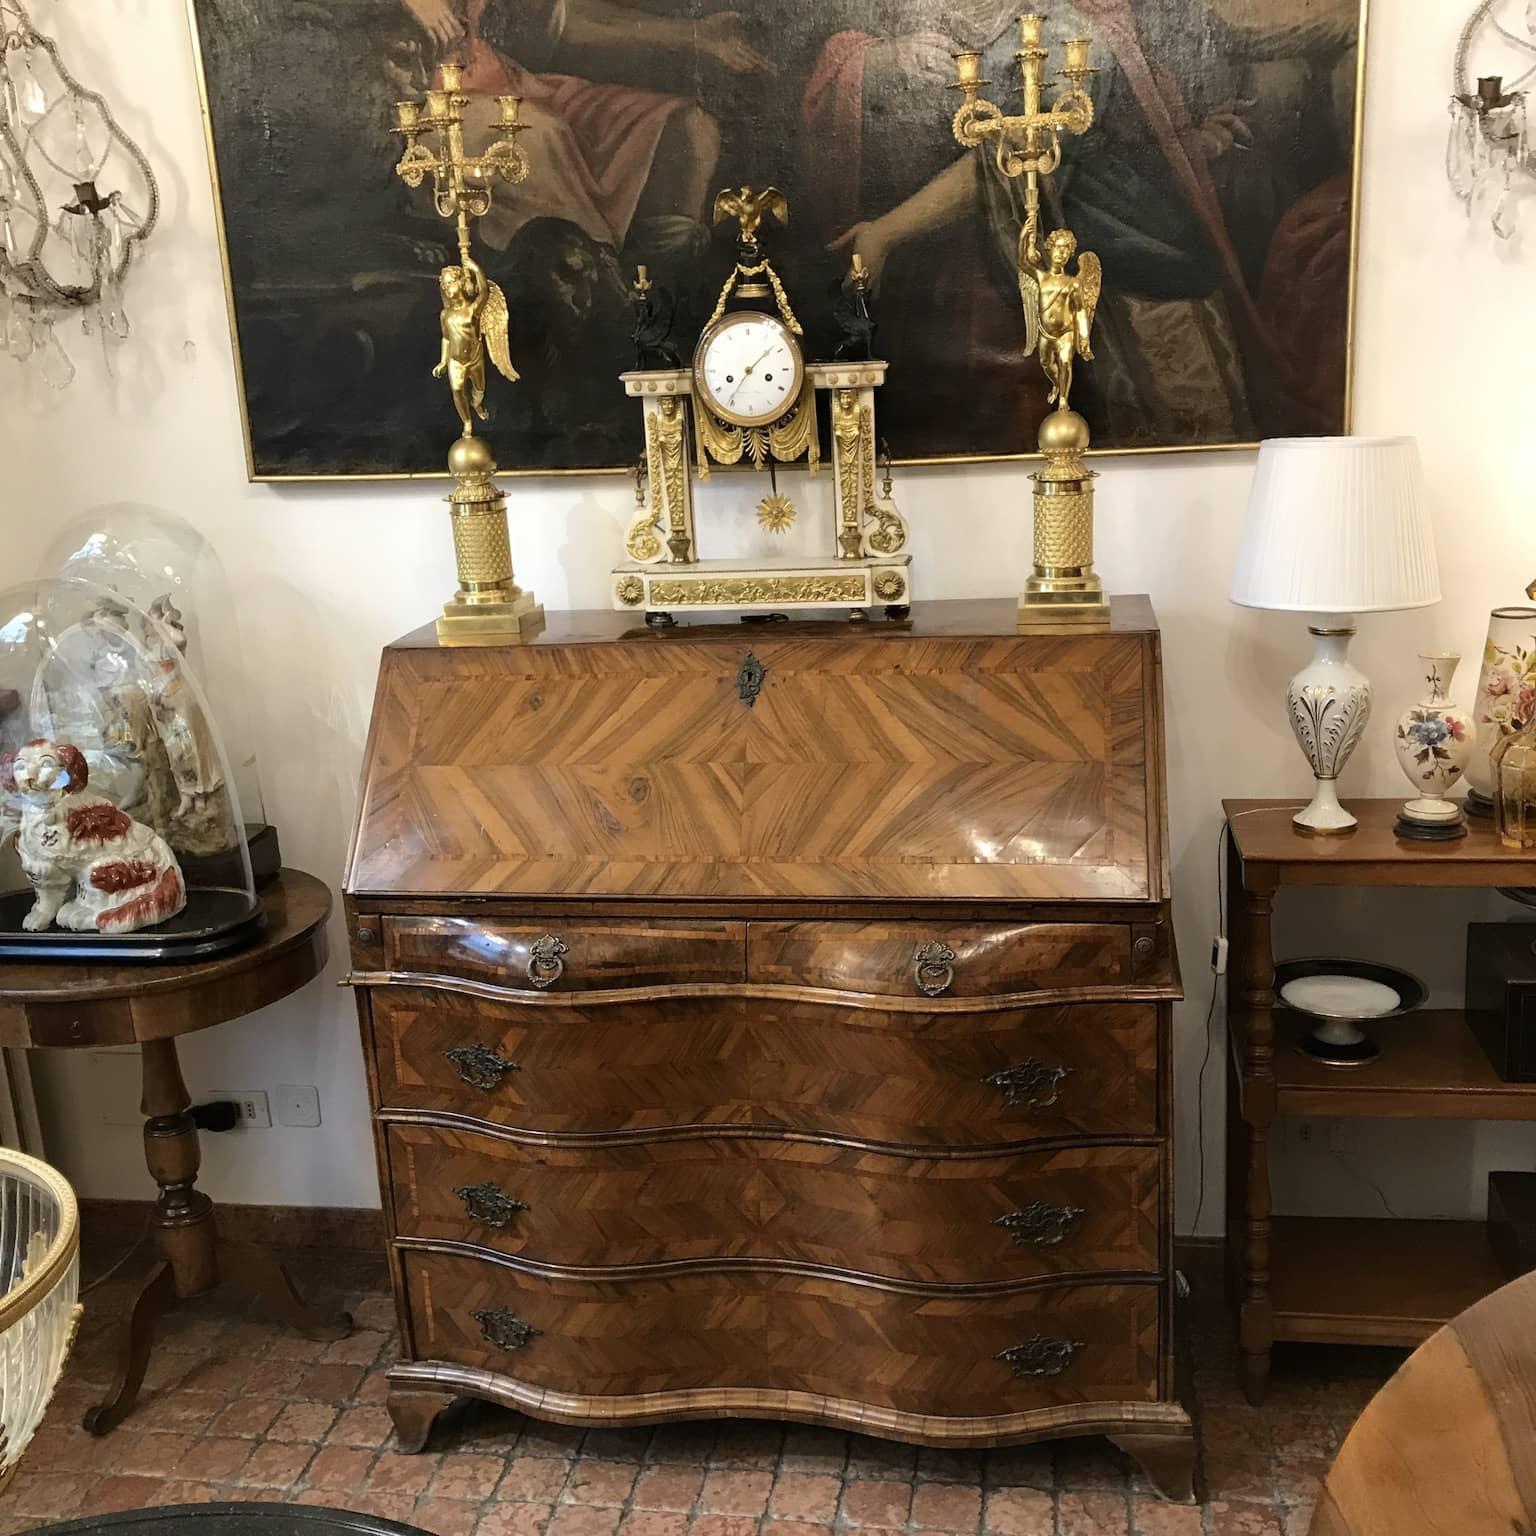 Datazione mobili antichi francesi